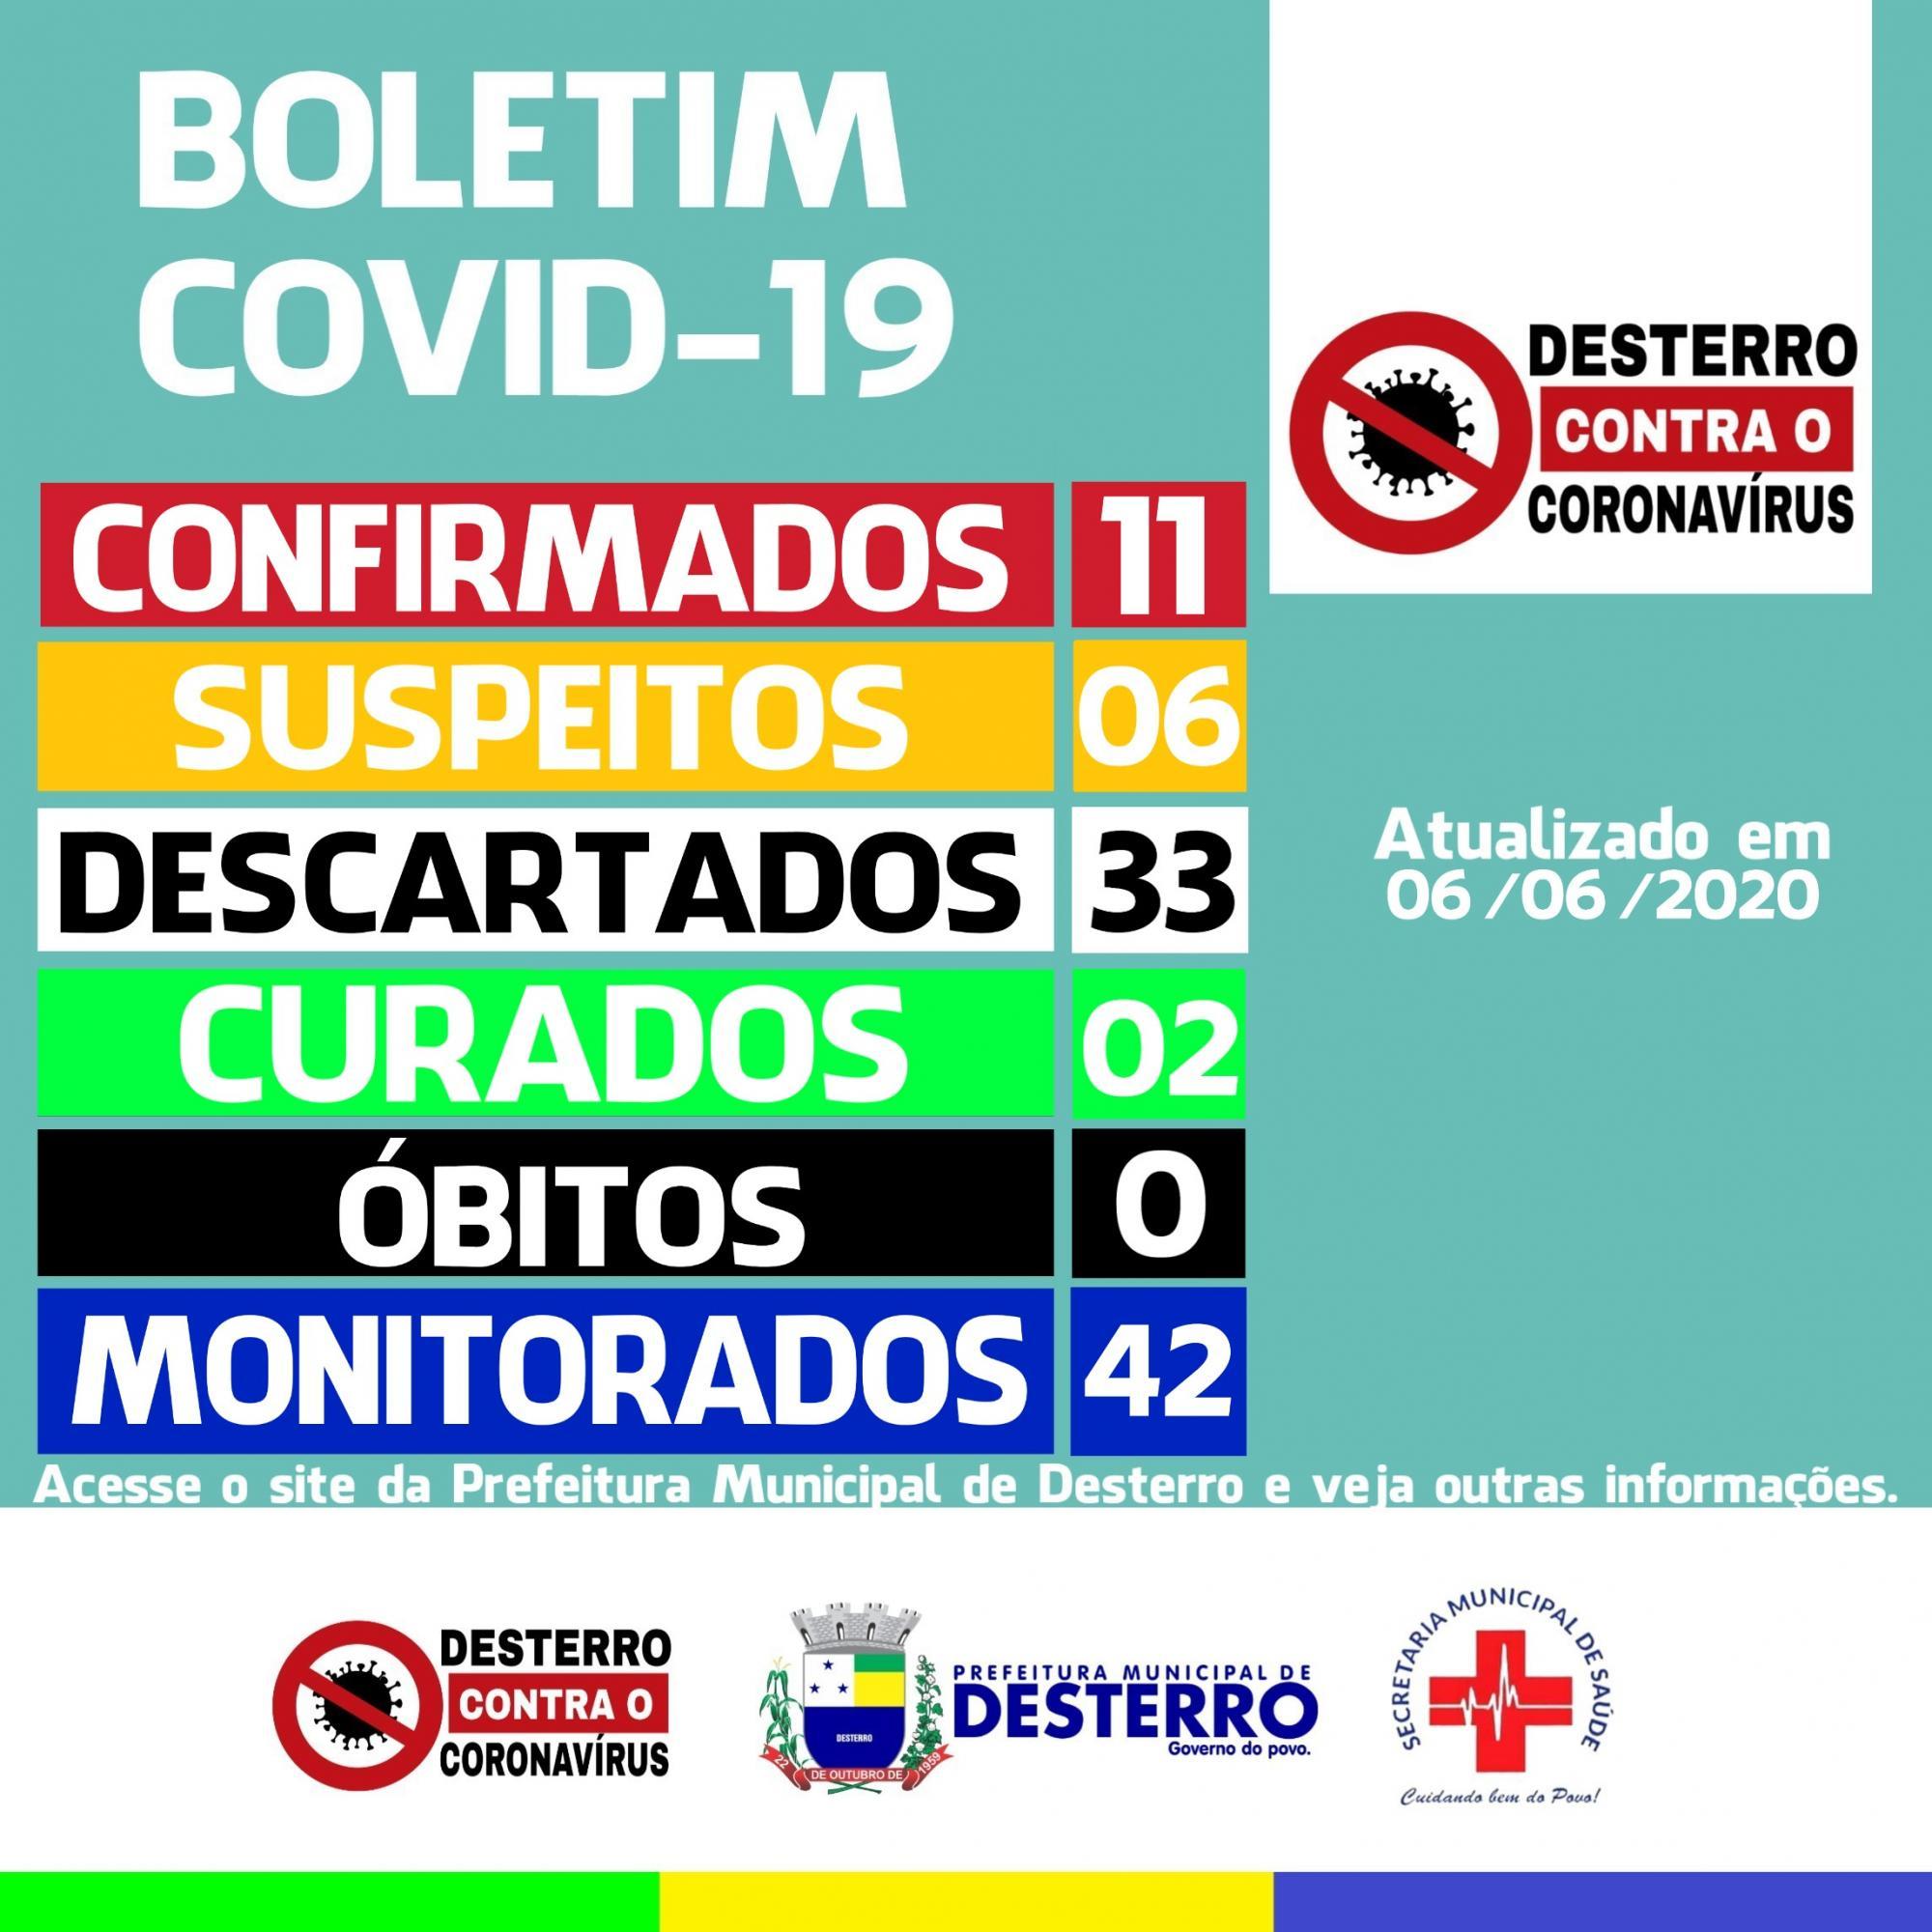 Boletim Covid-19 (06/06/2020)